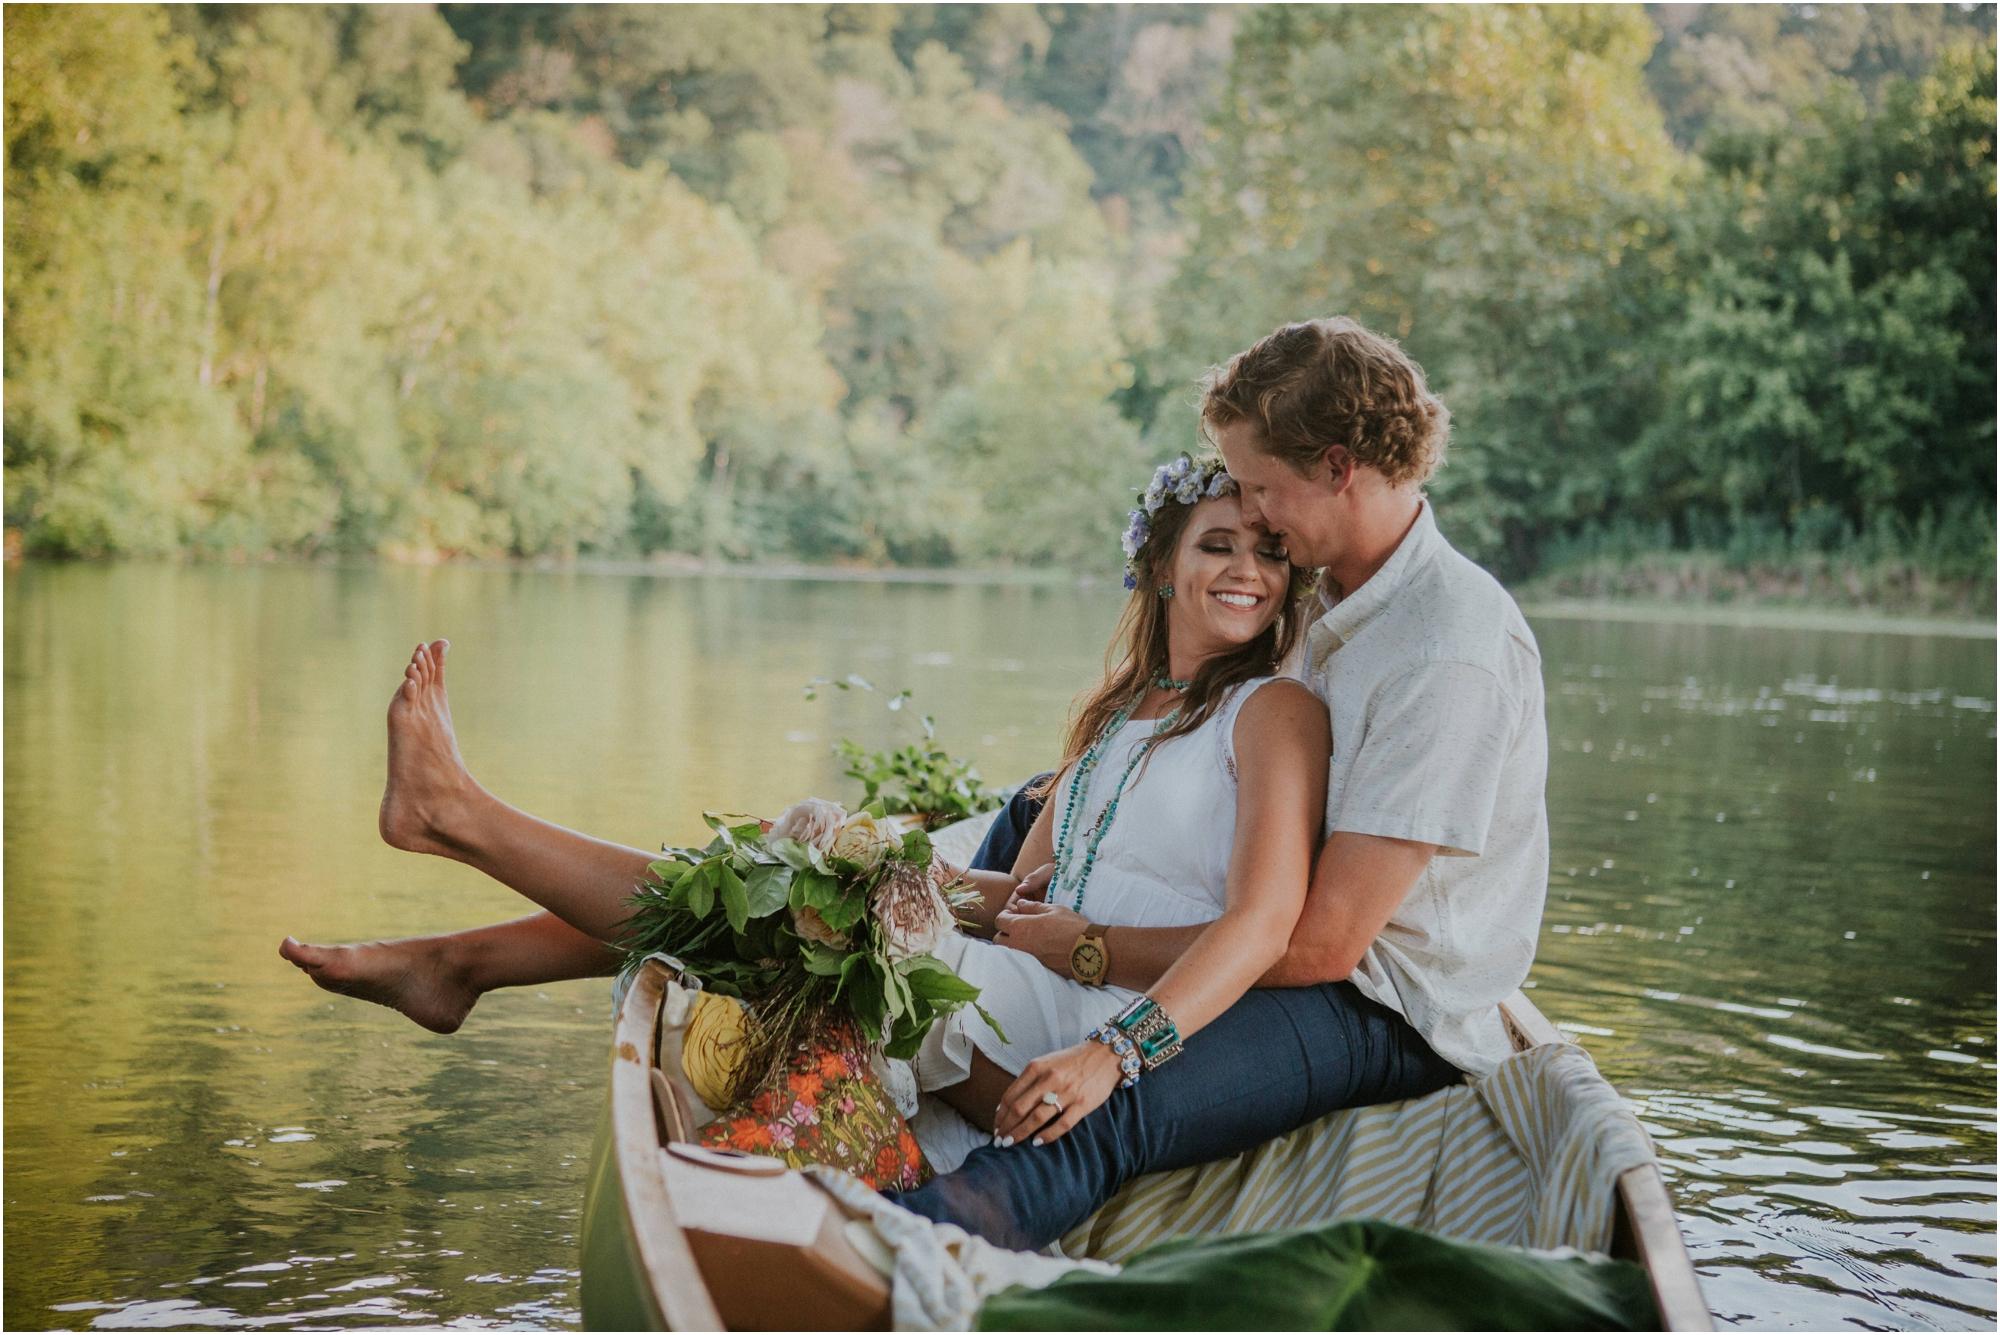 homestead-on-the-holston-hiltons-virginia-bohemian-canoe-styled-shoot-northeast-tennessee-elopement-wild-free-spirit_0022.jpg